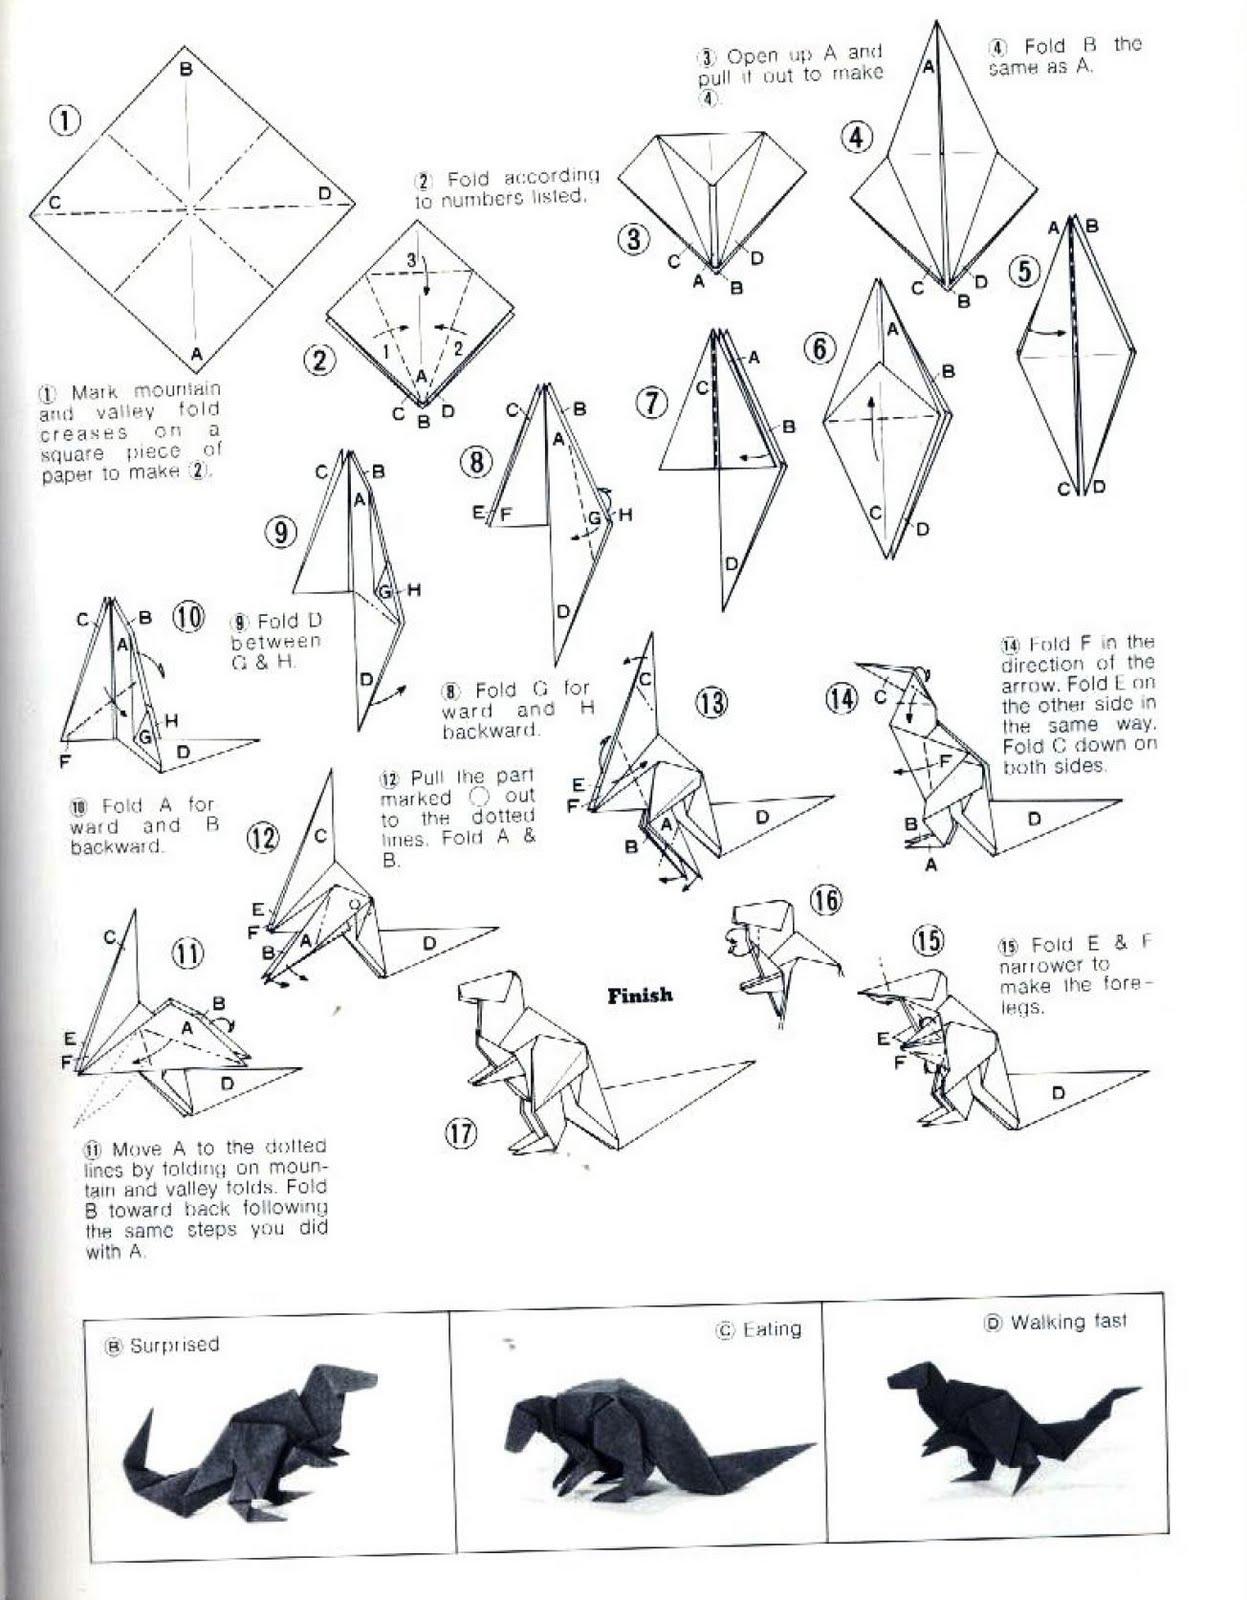 3d origami diagram animals 12 volt und 7 anper batterien gell how to make easy step by